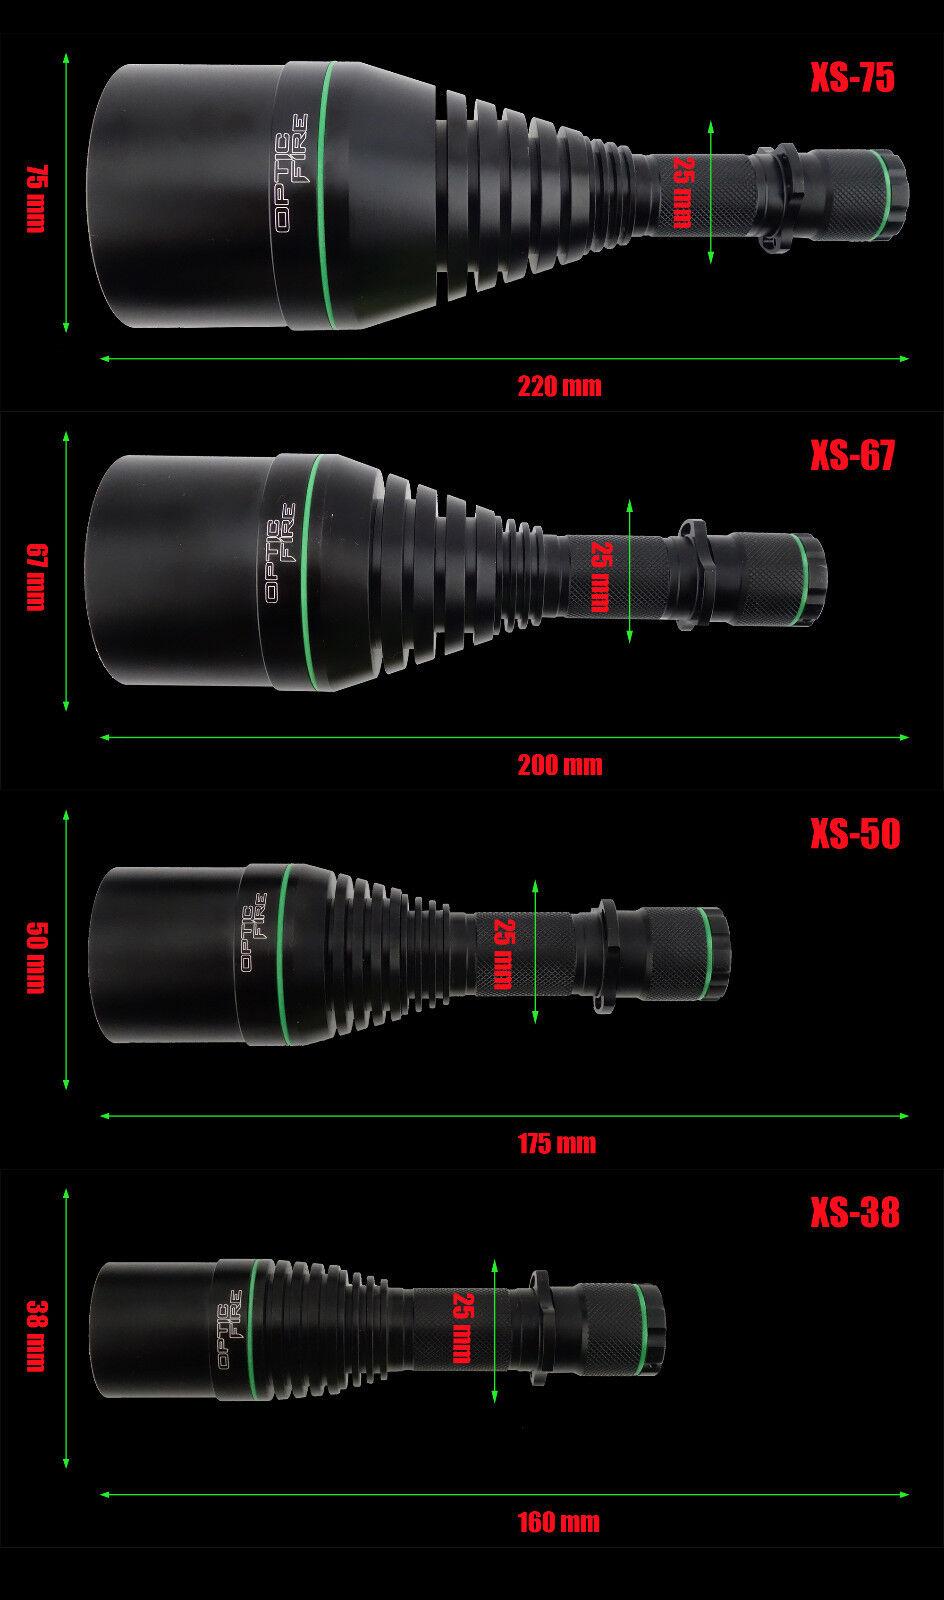 Opticfire® XS LED 3 LED XS High power hunting torch lamping lamp gun light deluxe kit 7d6386